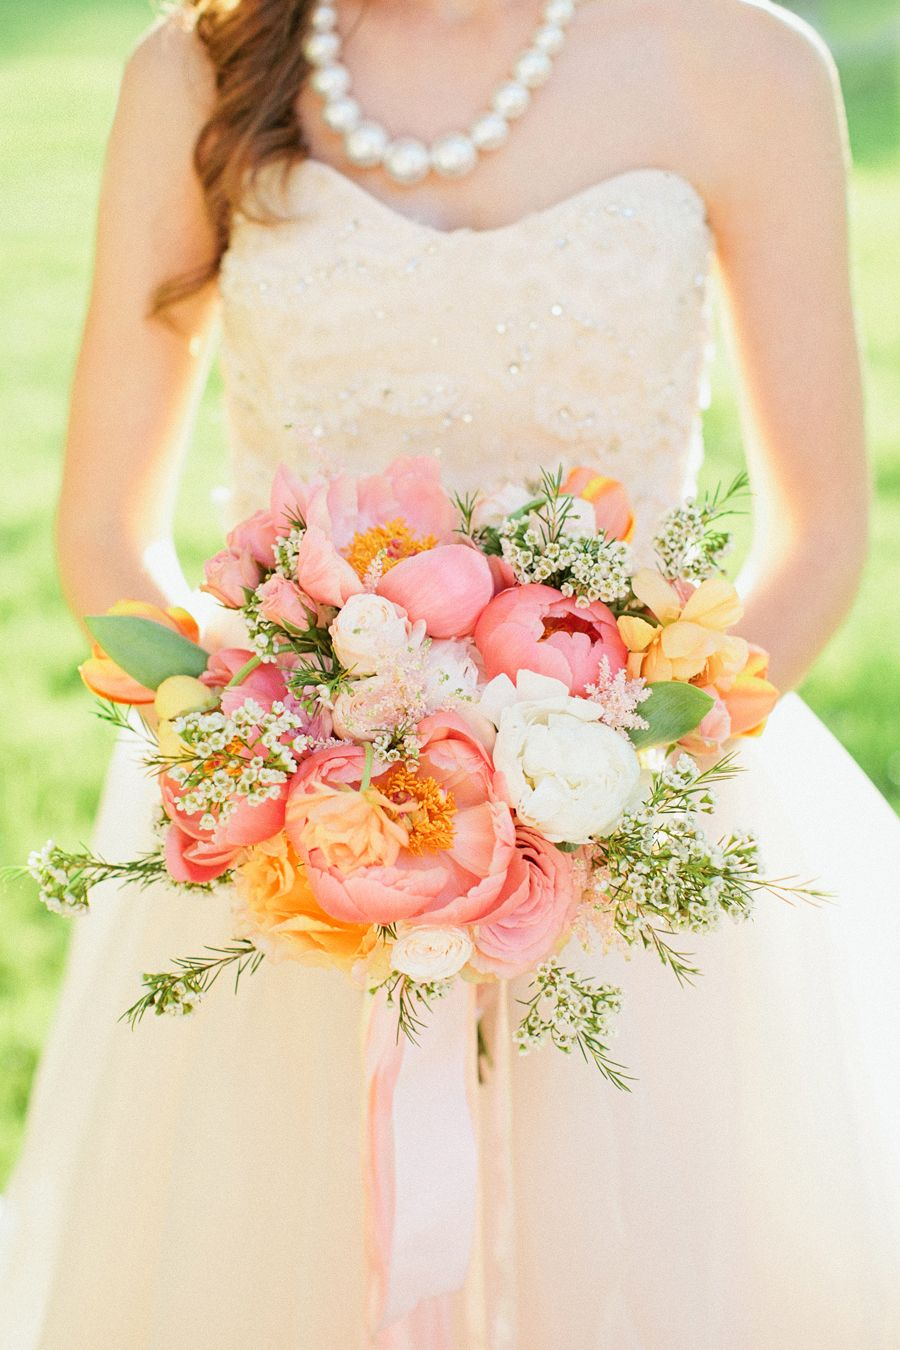 Peach and yellow bouquet yellow bouquets peach and bouquet flower ideas peach and yellow bouquet by cedarwood weddings izmirmasajfo